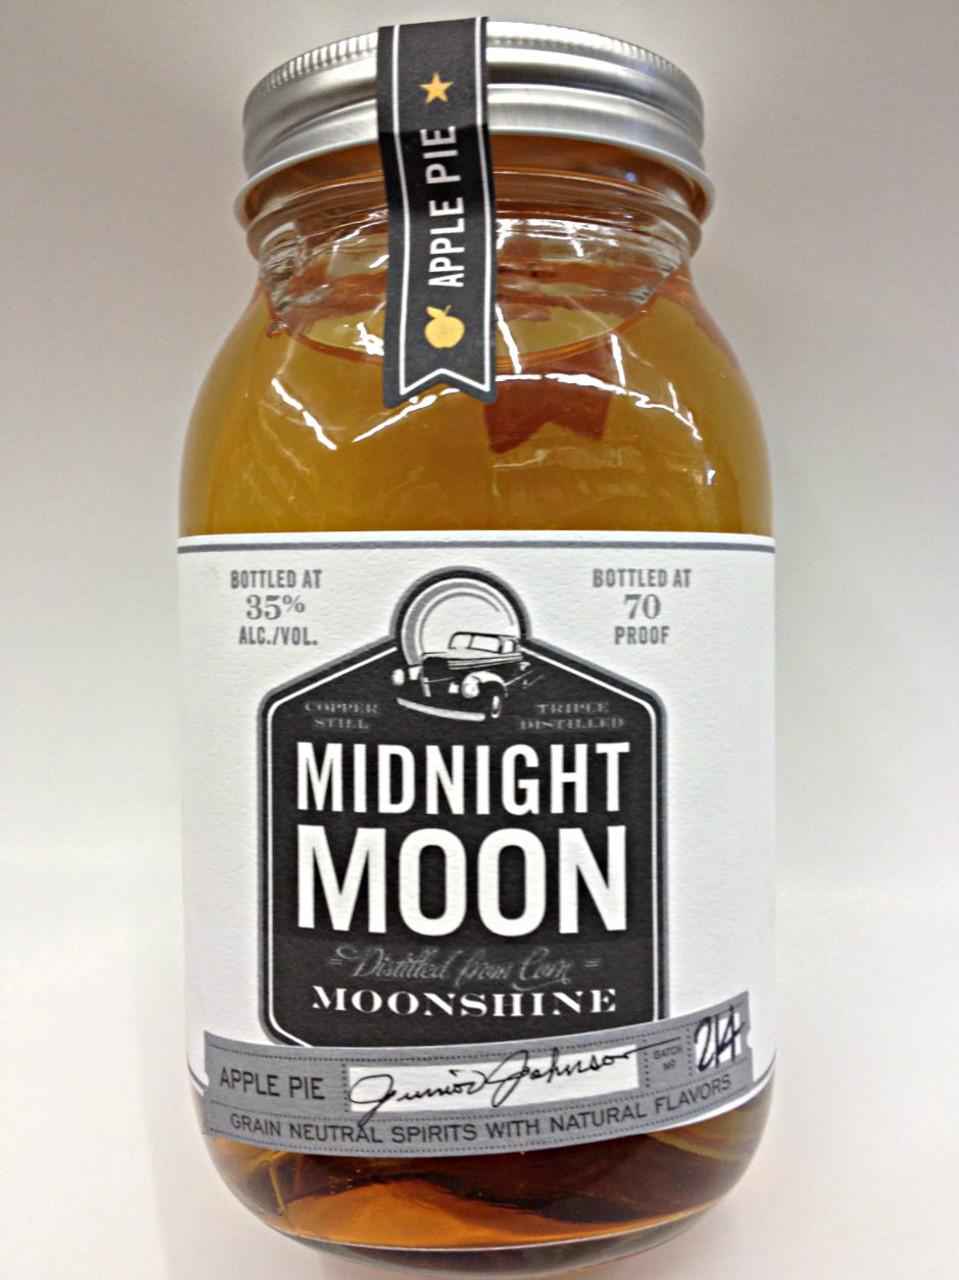 Midnight Moon Moonshine | Apple Pie Moonshine | Quality ...